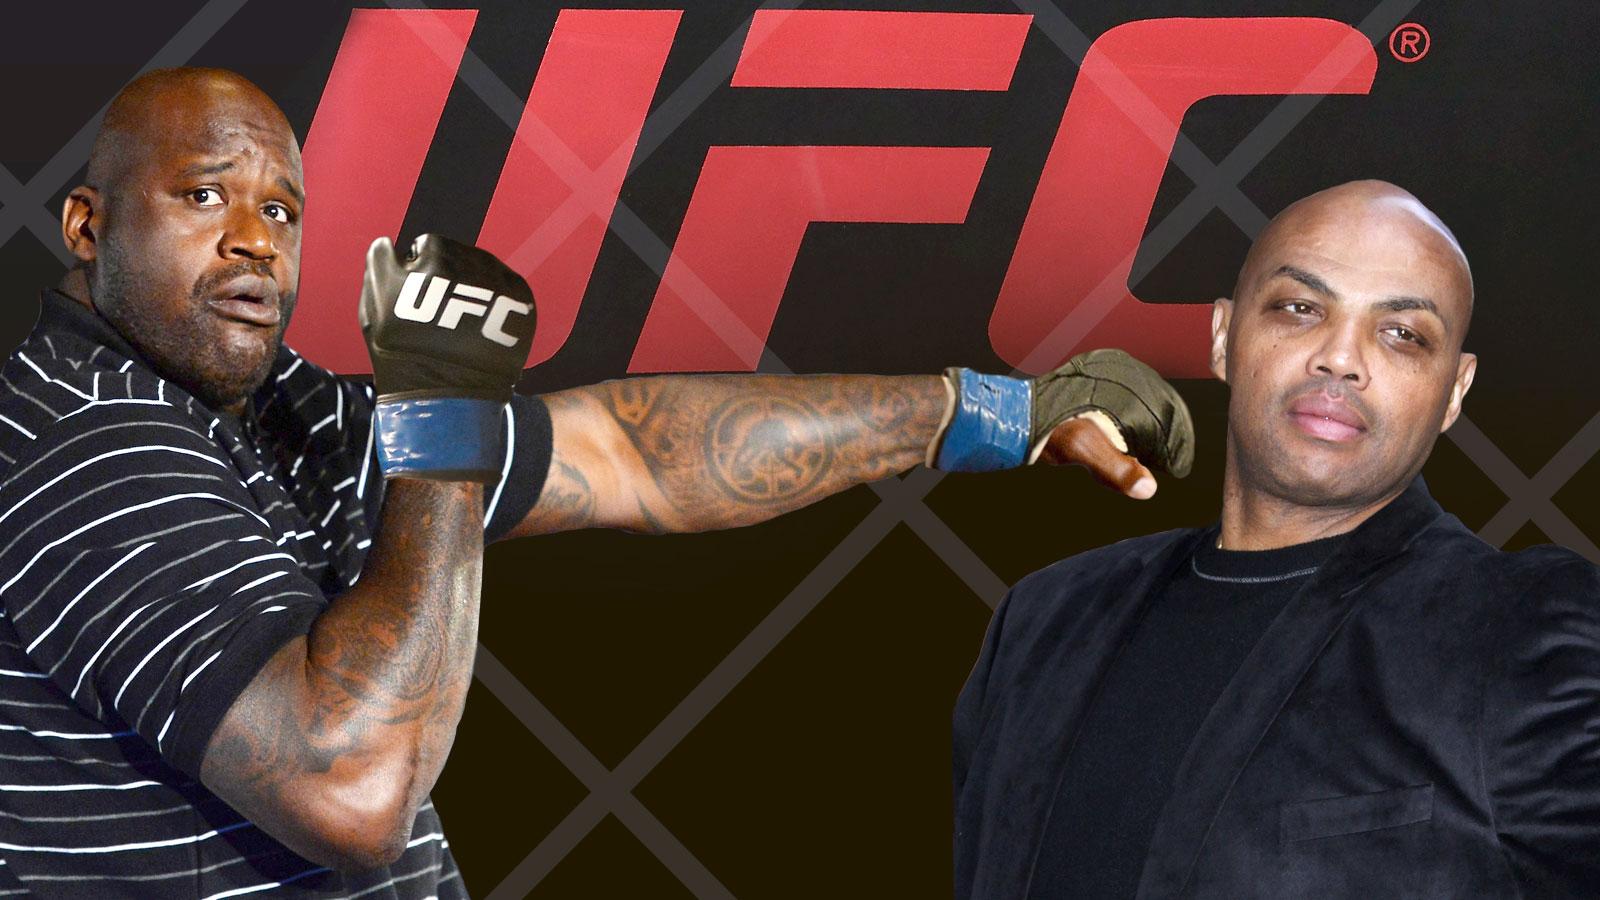 050814-UFC-Shaq-Barkley-JT-PI